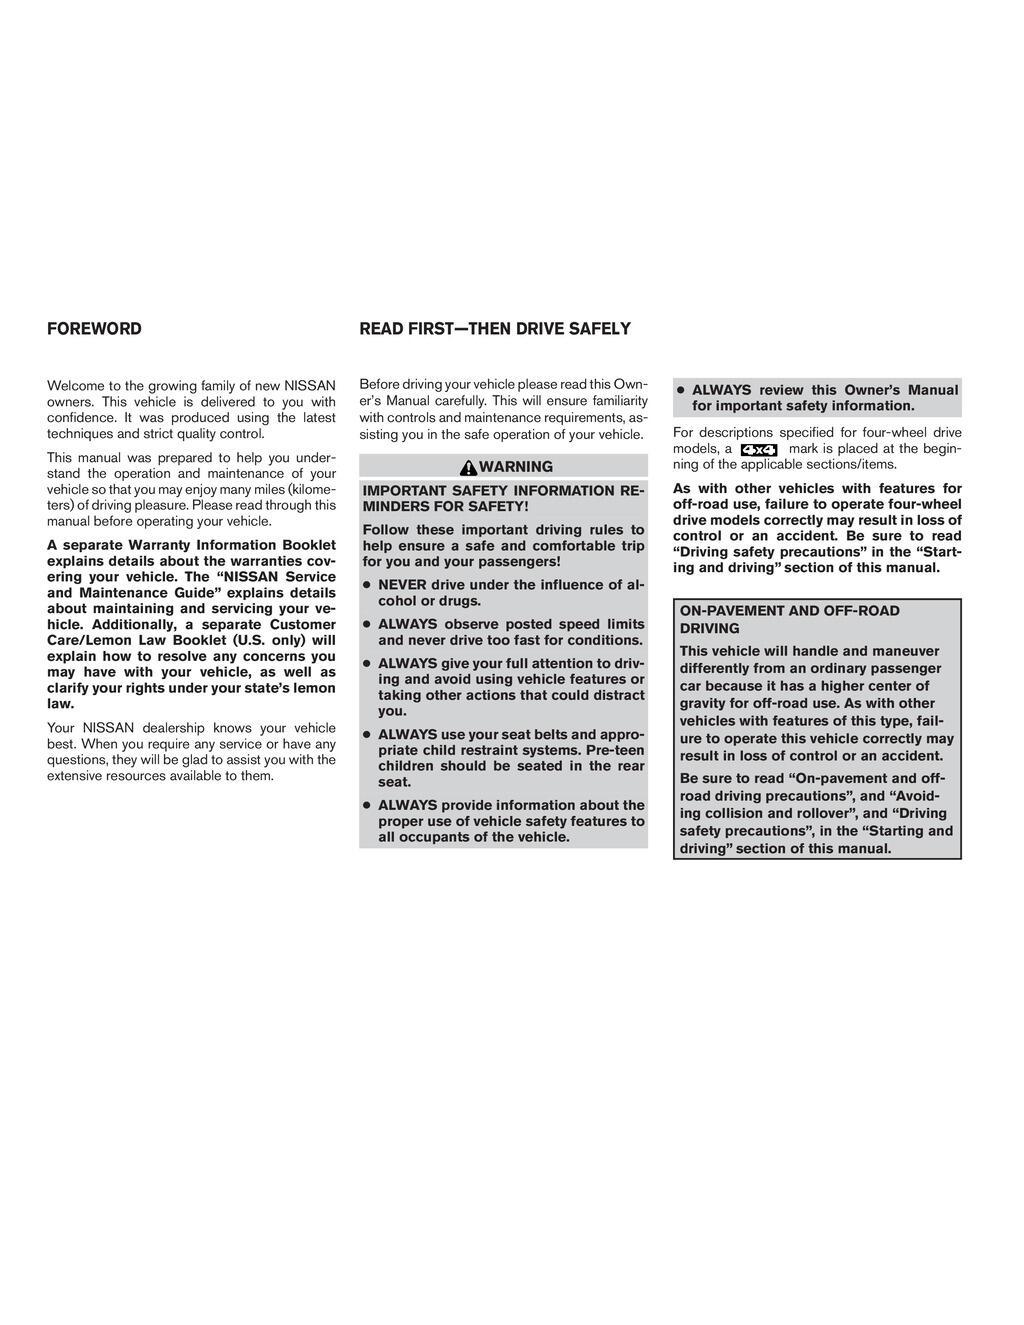 2009 Nissan Titan owners manual